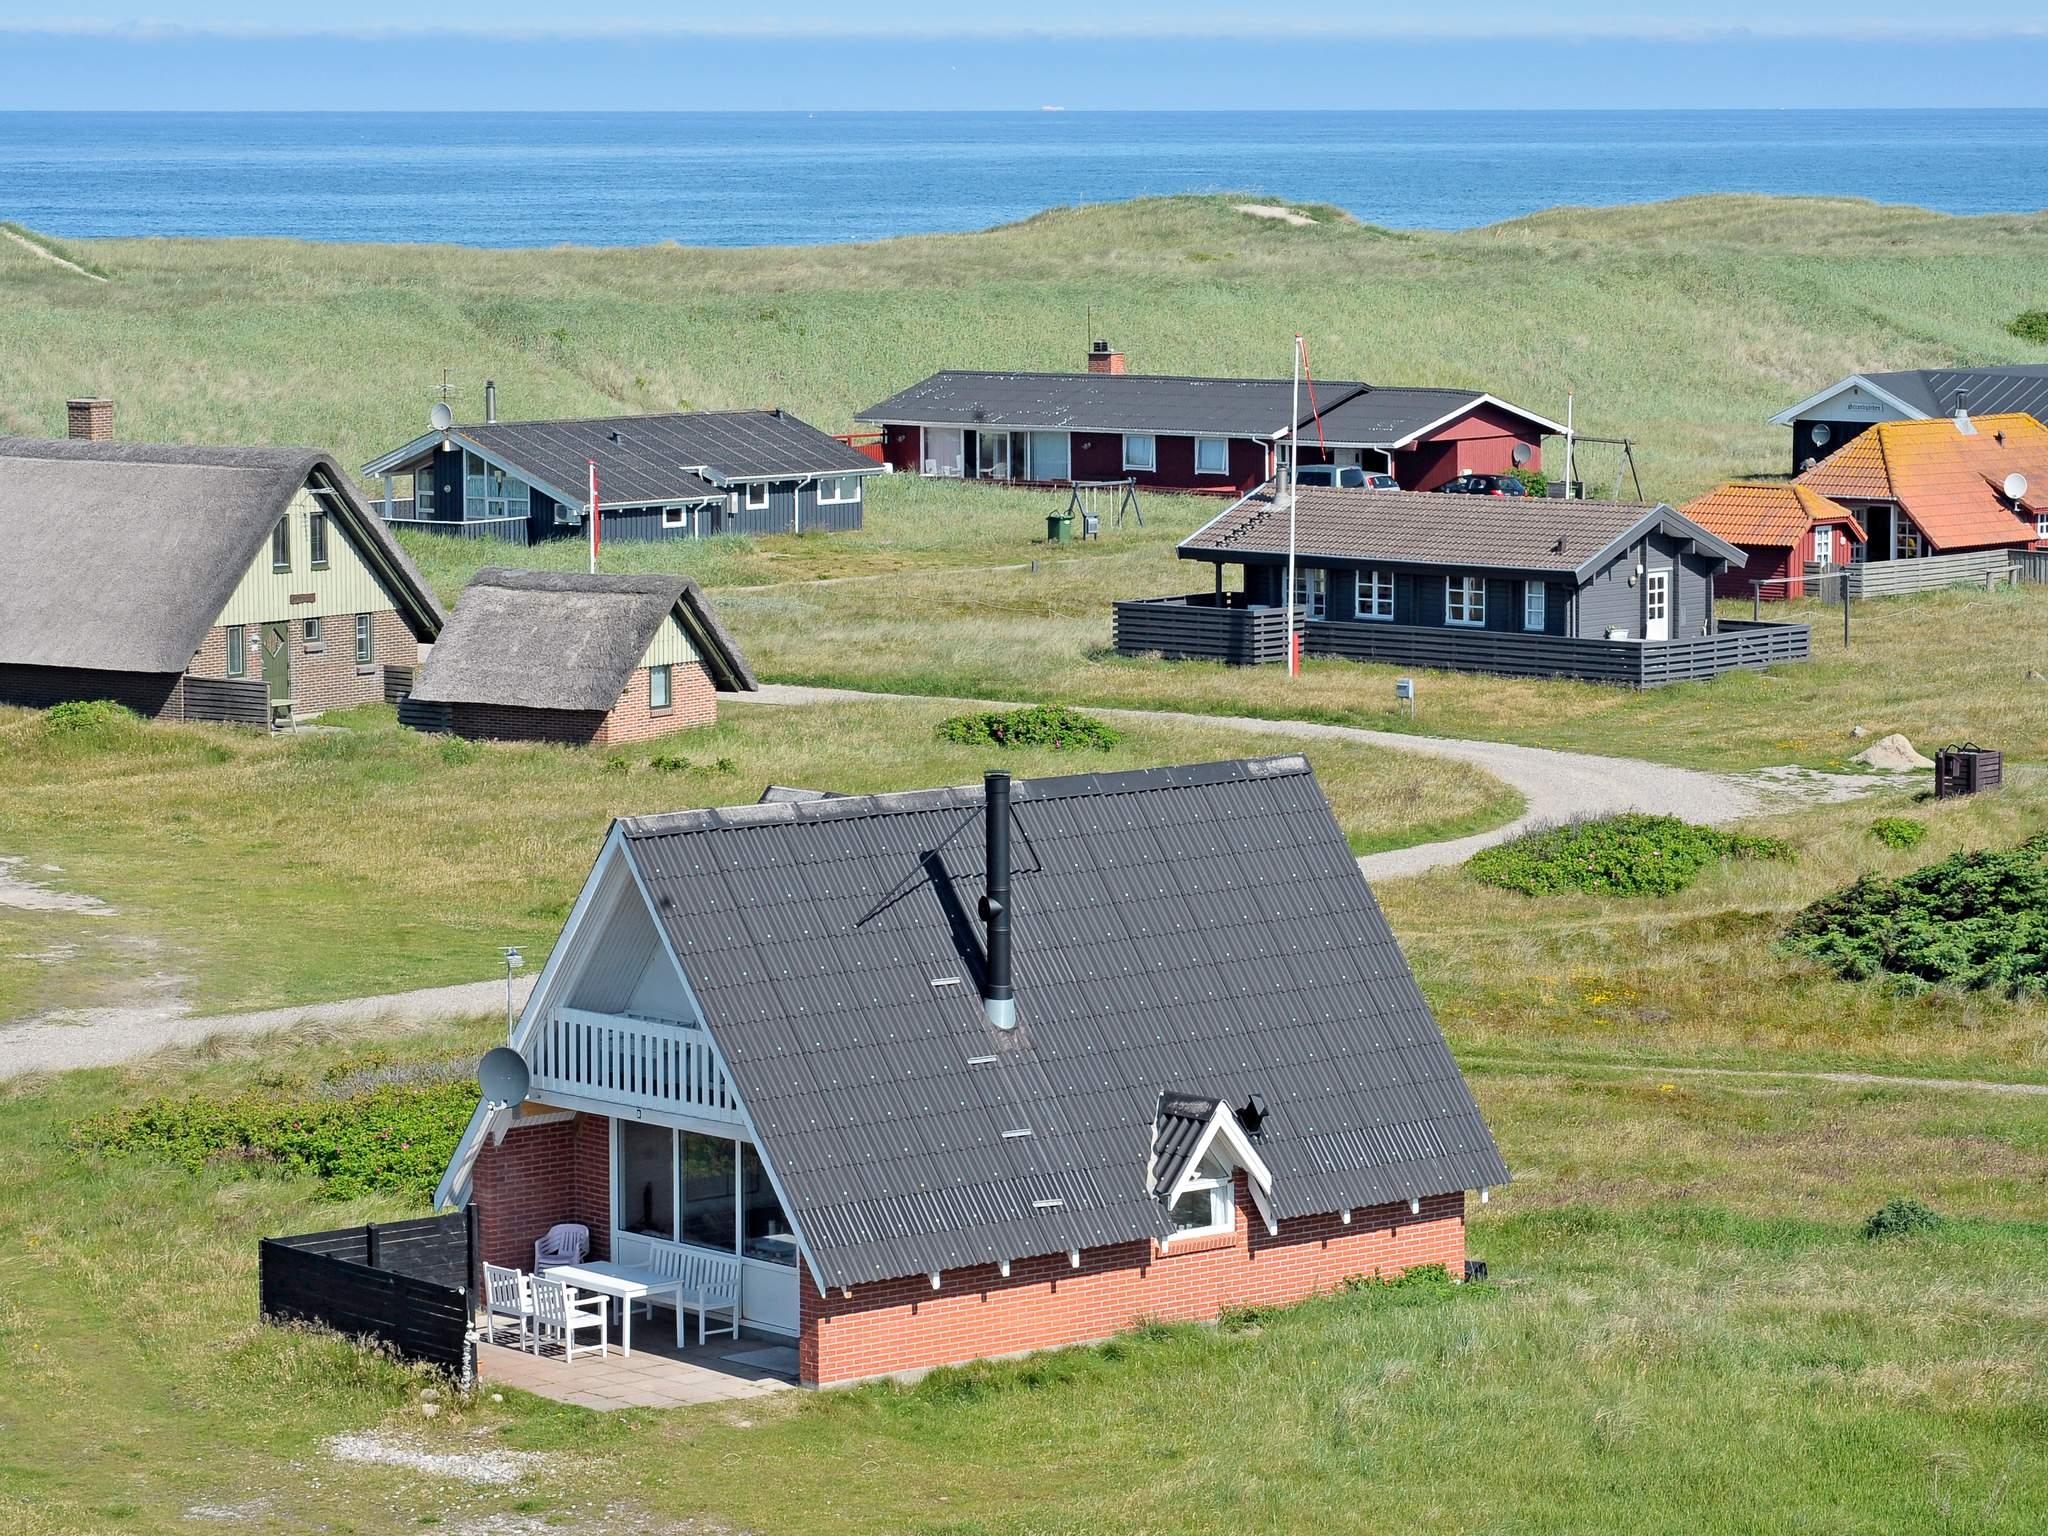 Ferienhaus Vrist (88948), Vrist, , Limfjord, Dänemark, Bild 29